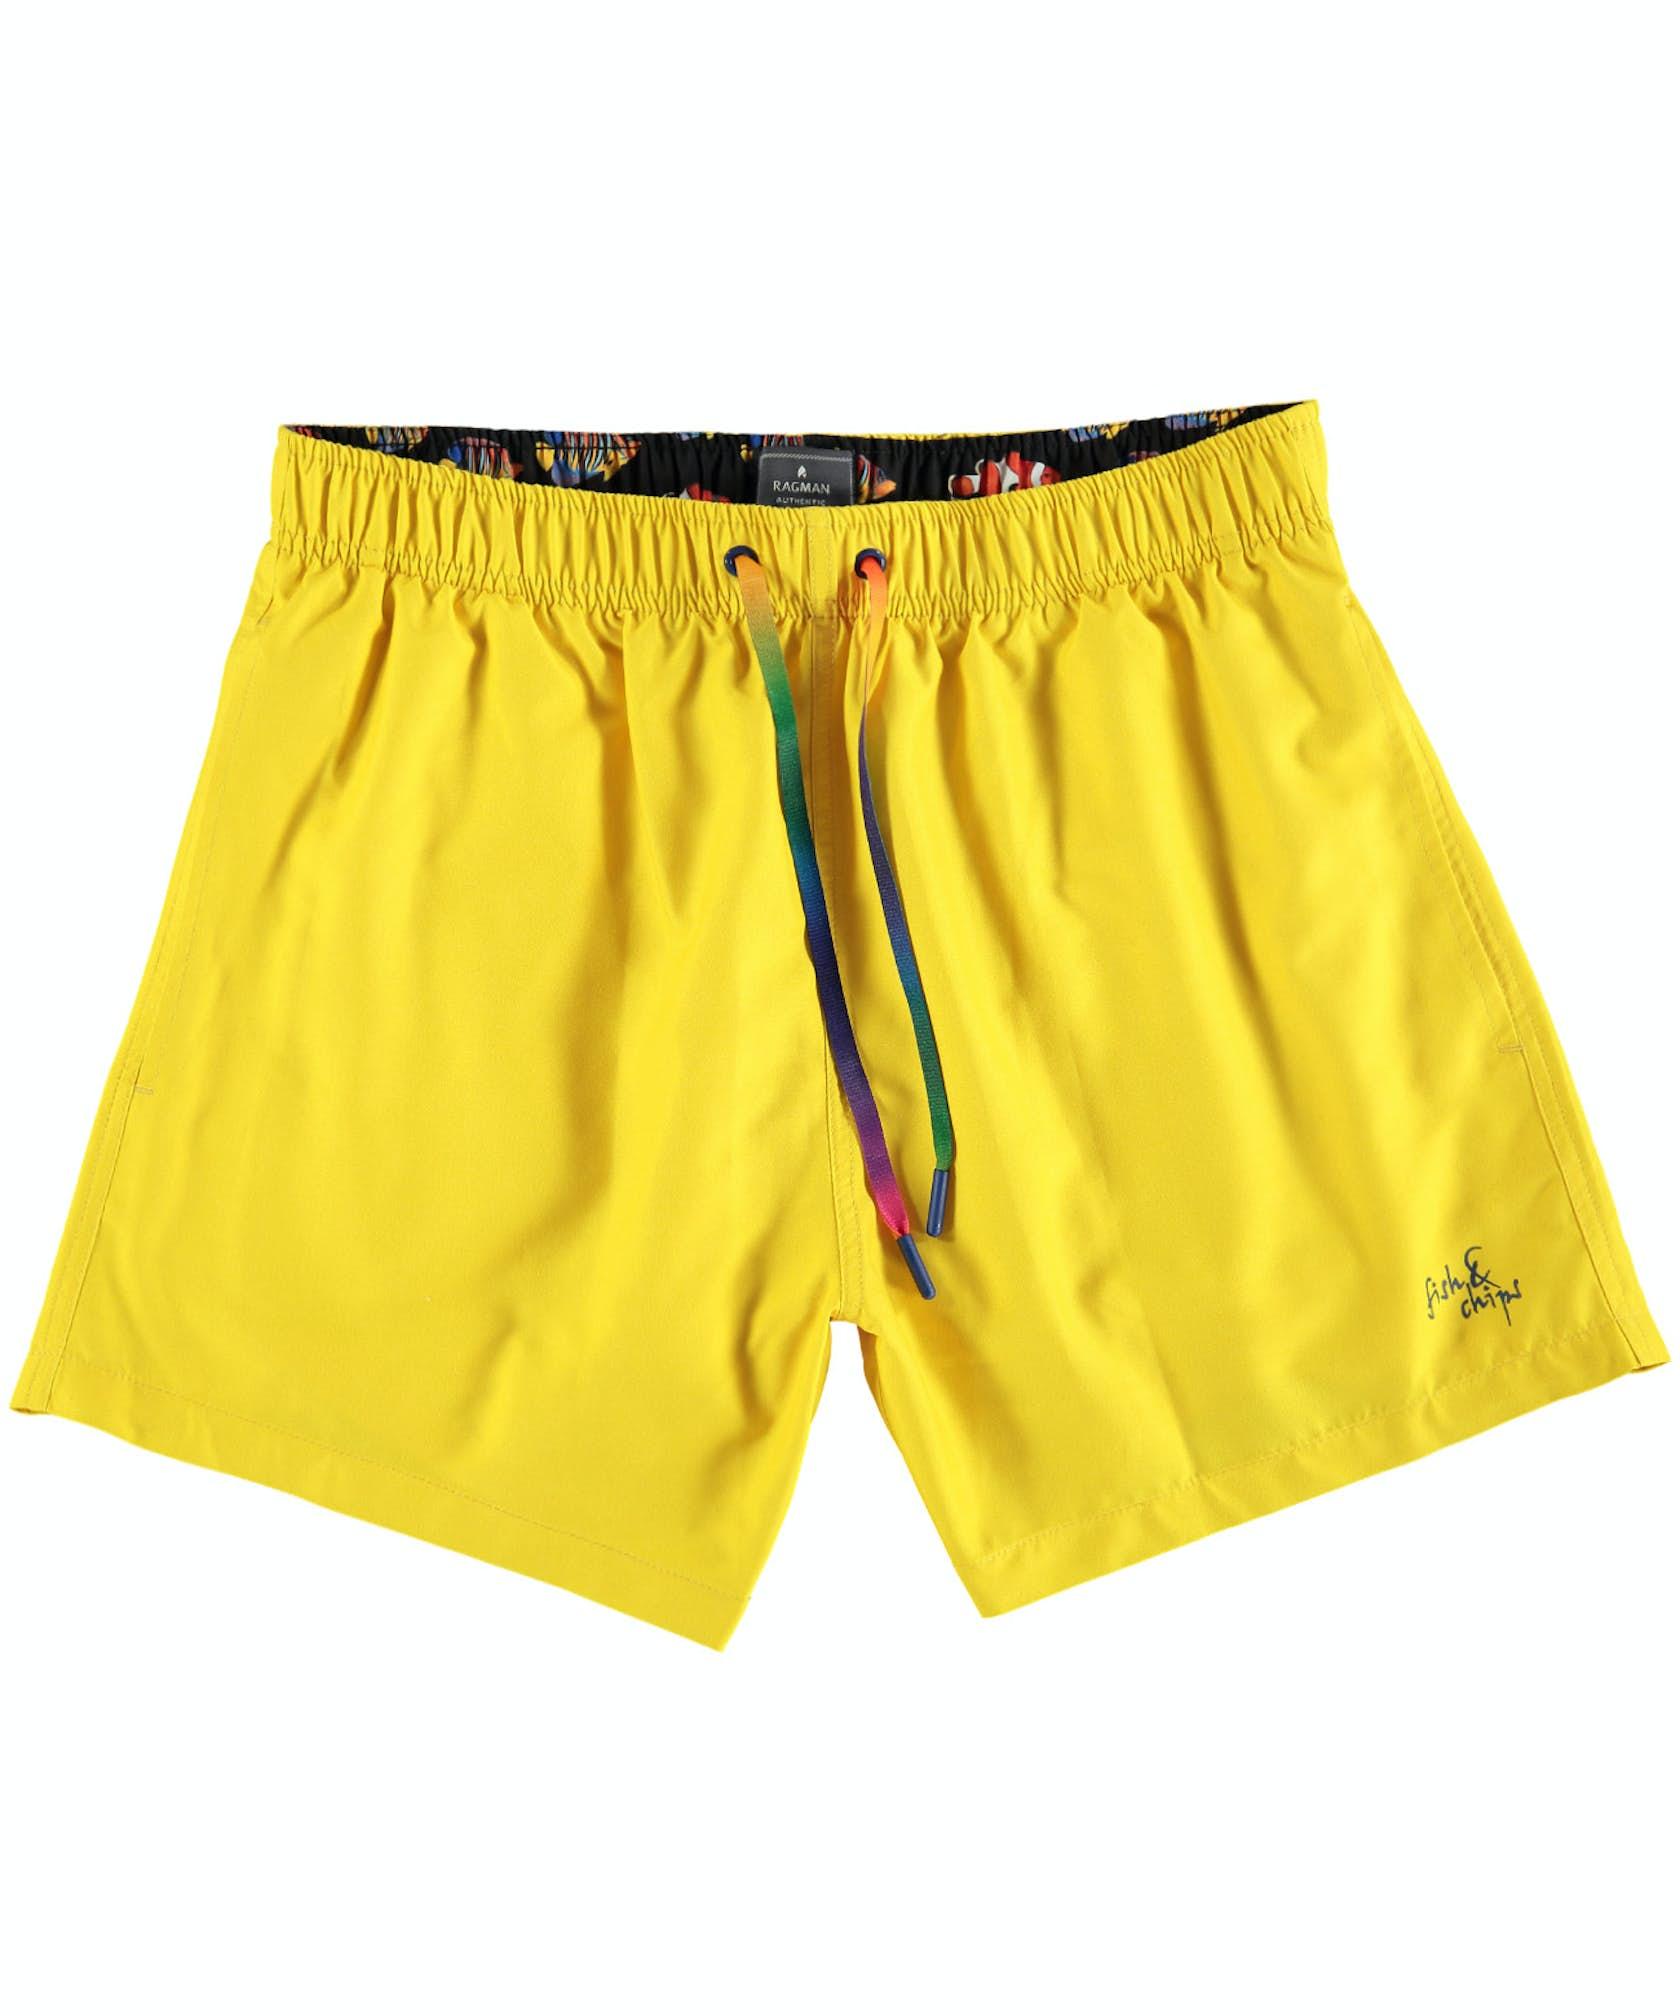 RAGMAN Bade-Shorts uni